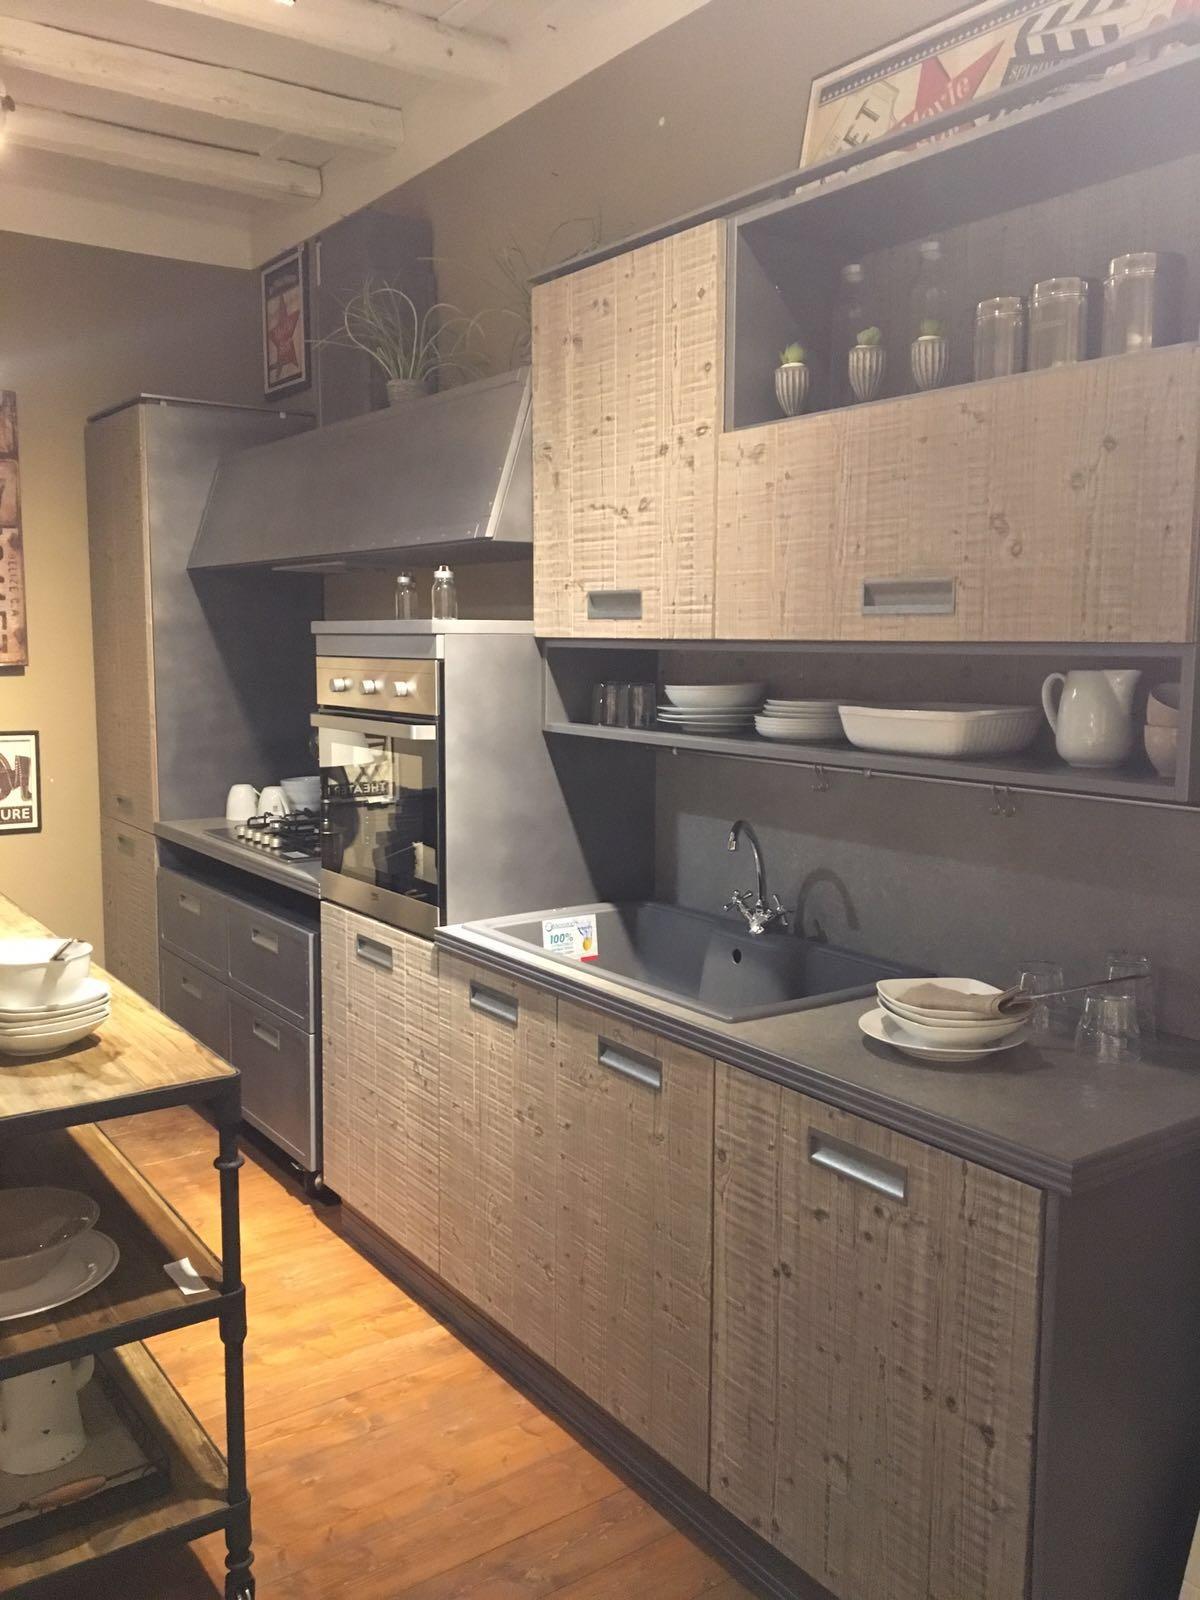 Cucina exedra marchi group scontata del 48 cucine a - Marche cucine a gas ...